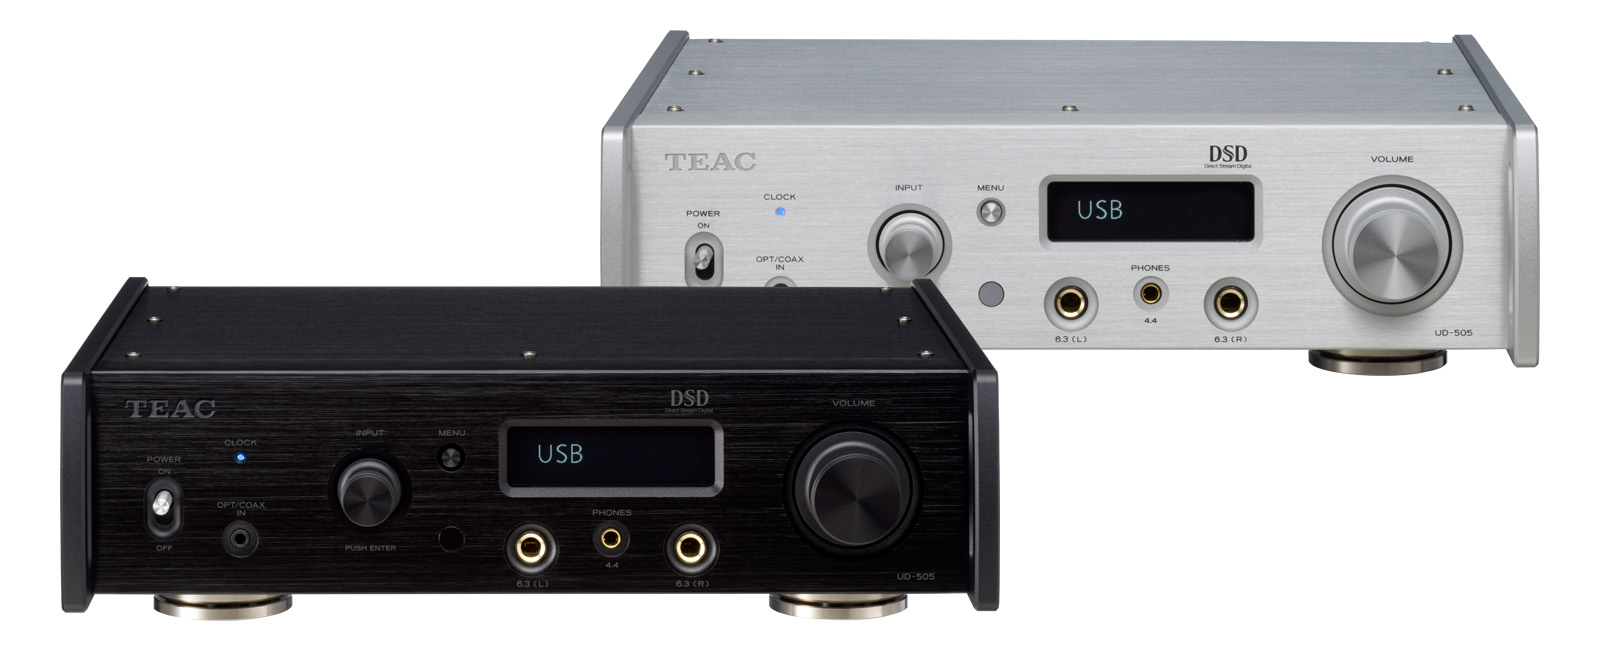 UD-505